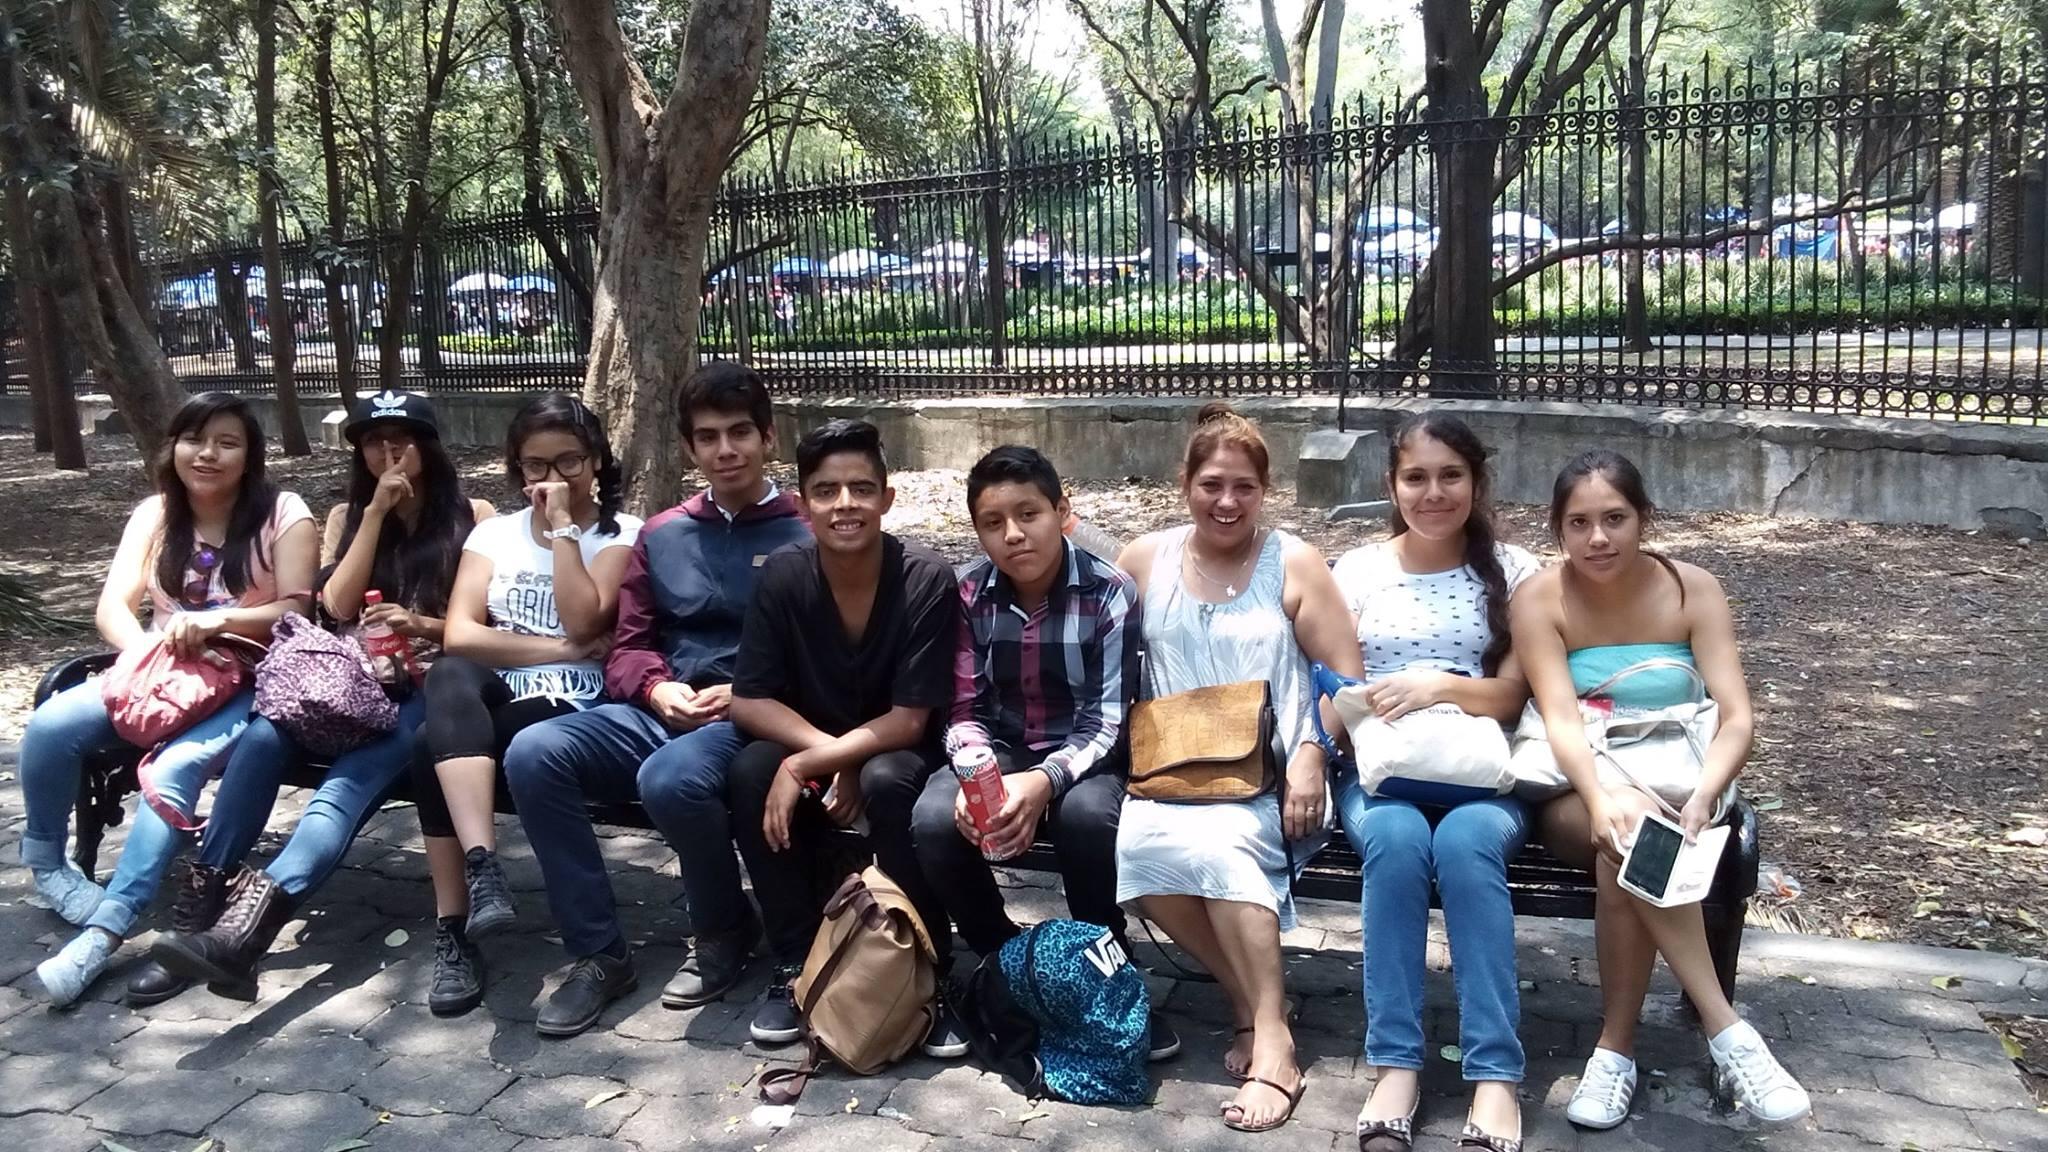 Visita al Castillo de Chapultepec 3